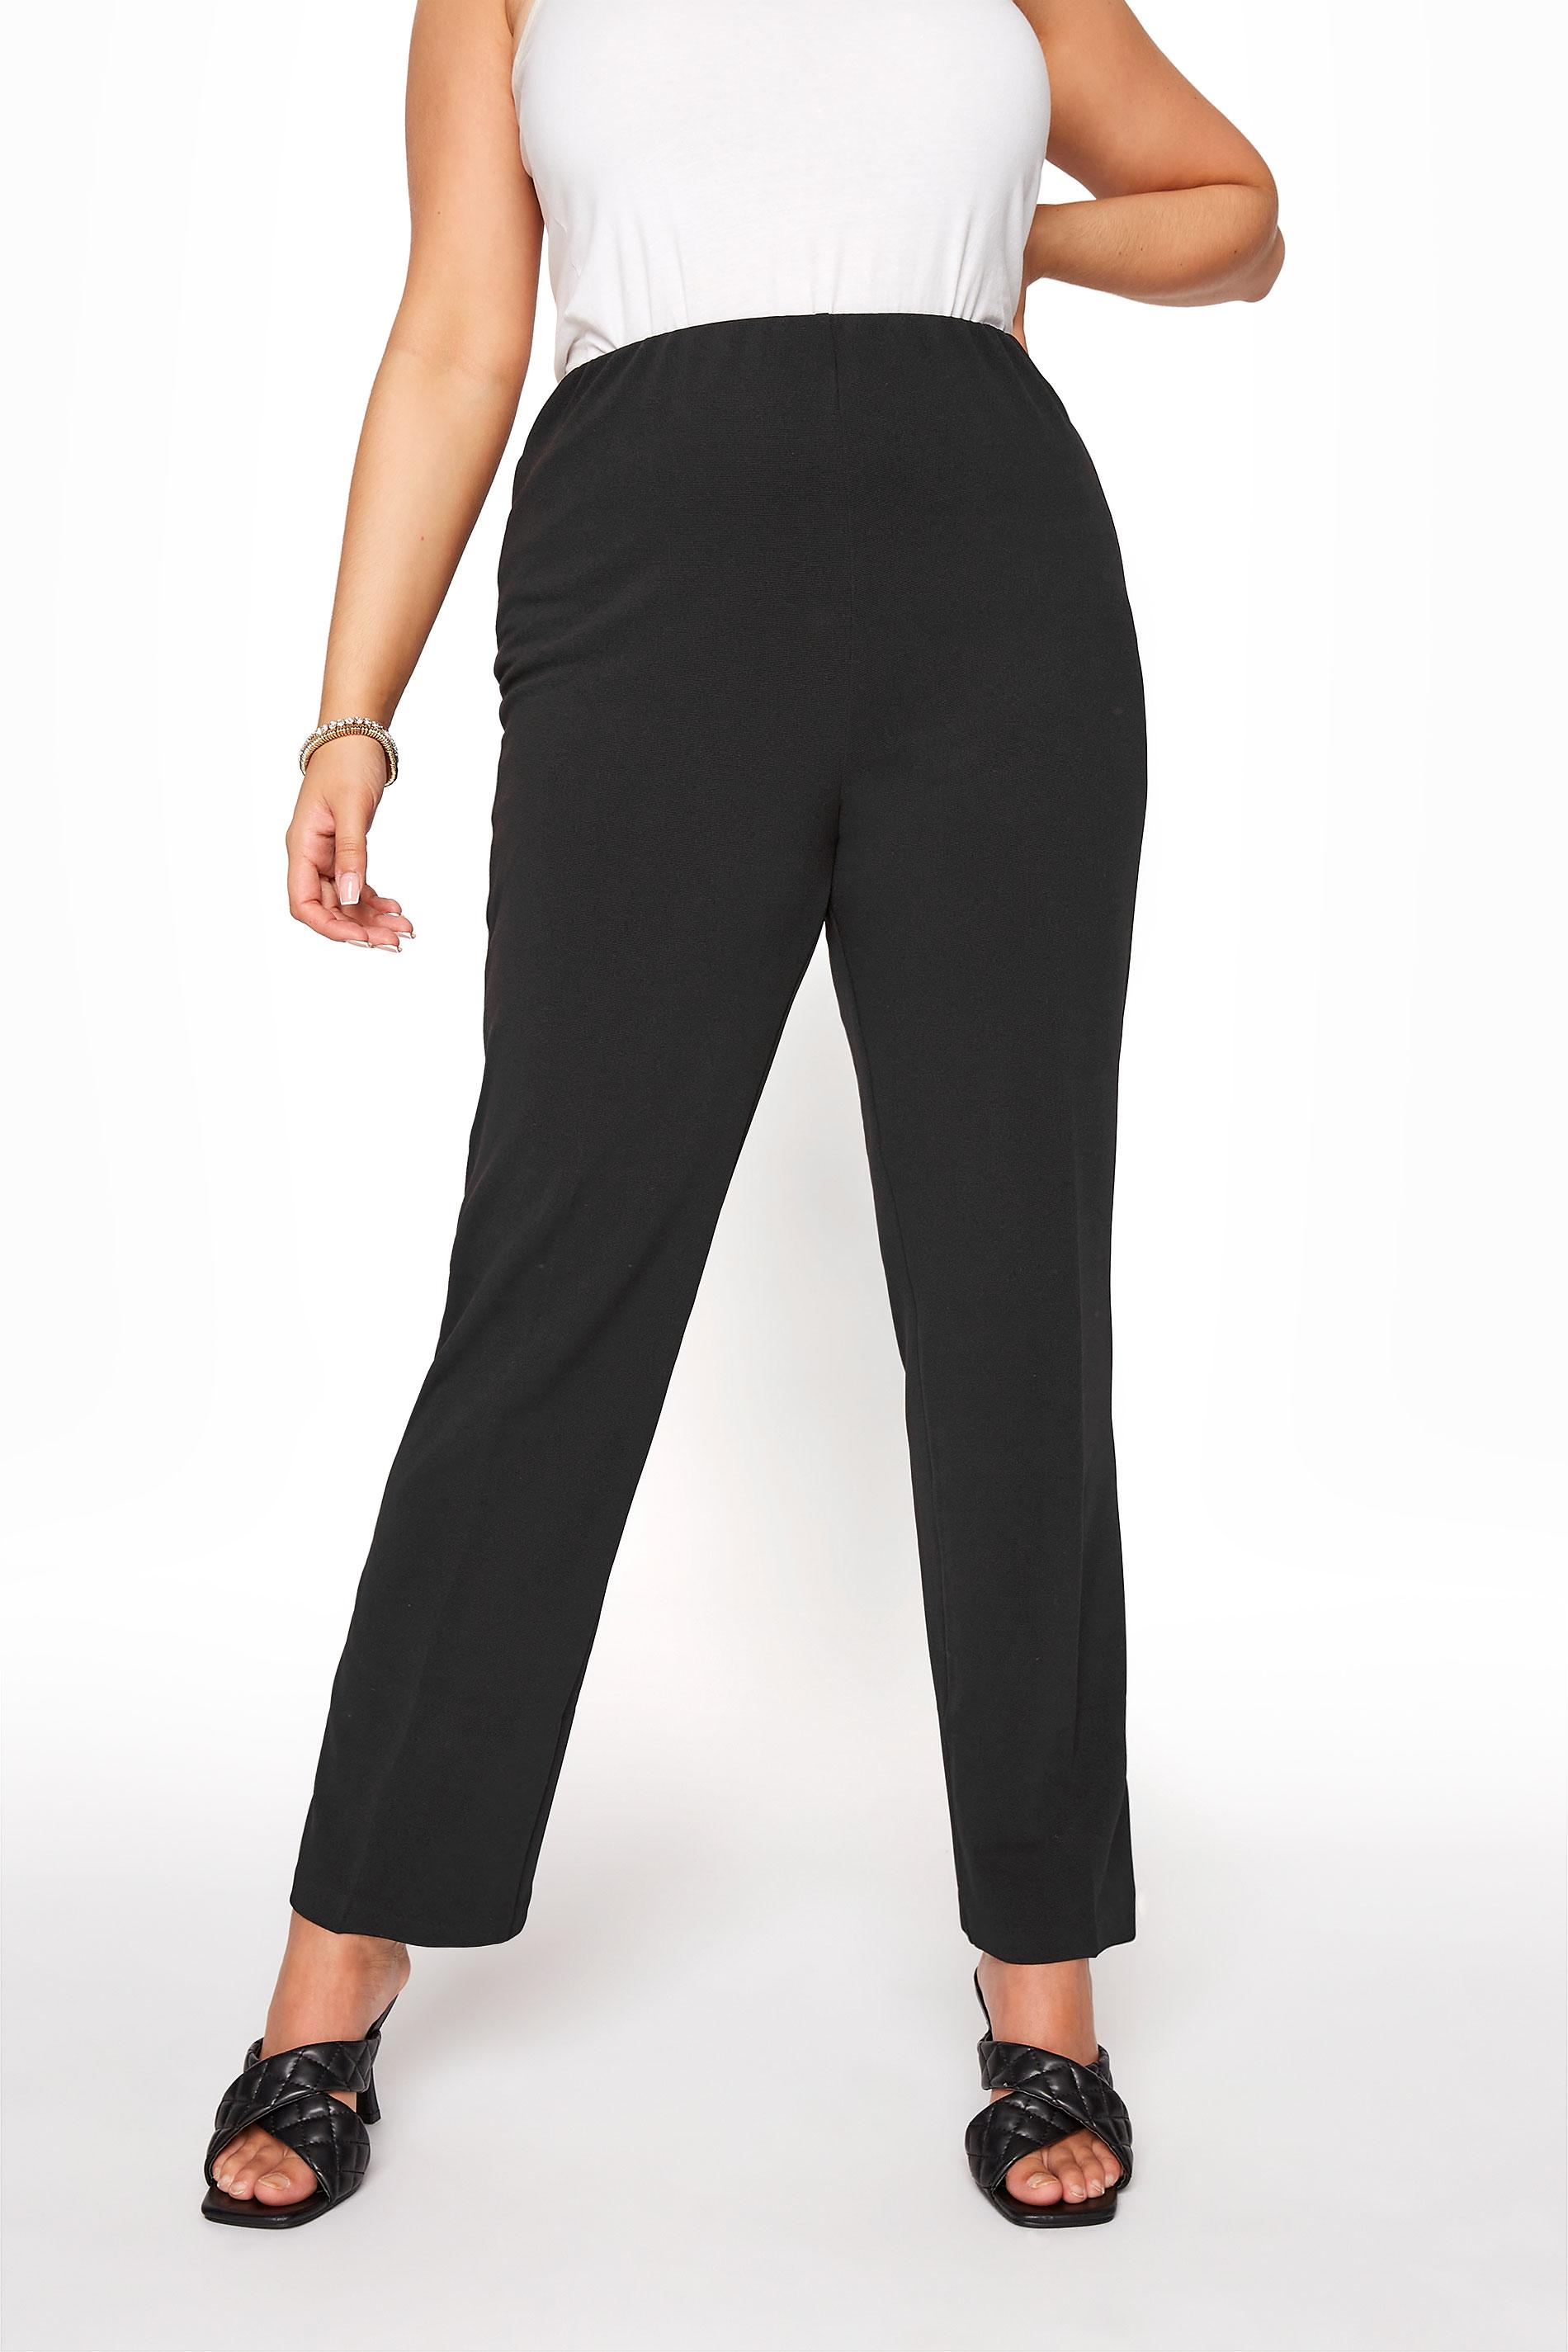 BESTSELLER Black Pull On Ribbed Bootcut Trousers_B.jpg